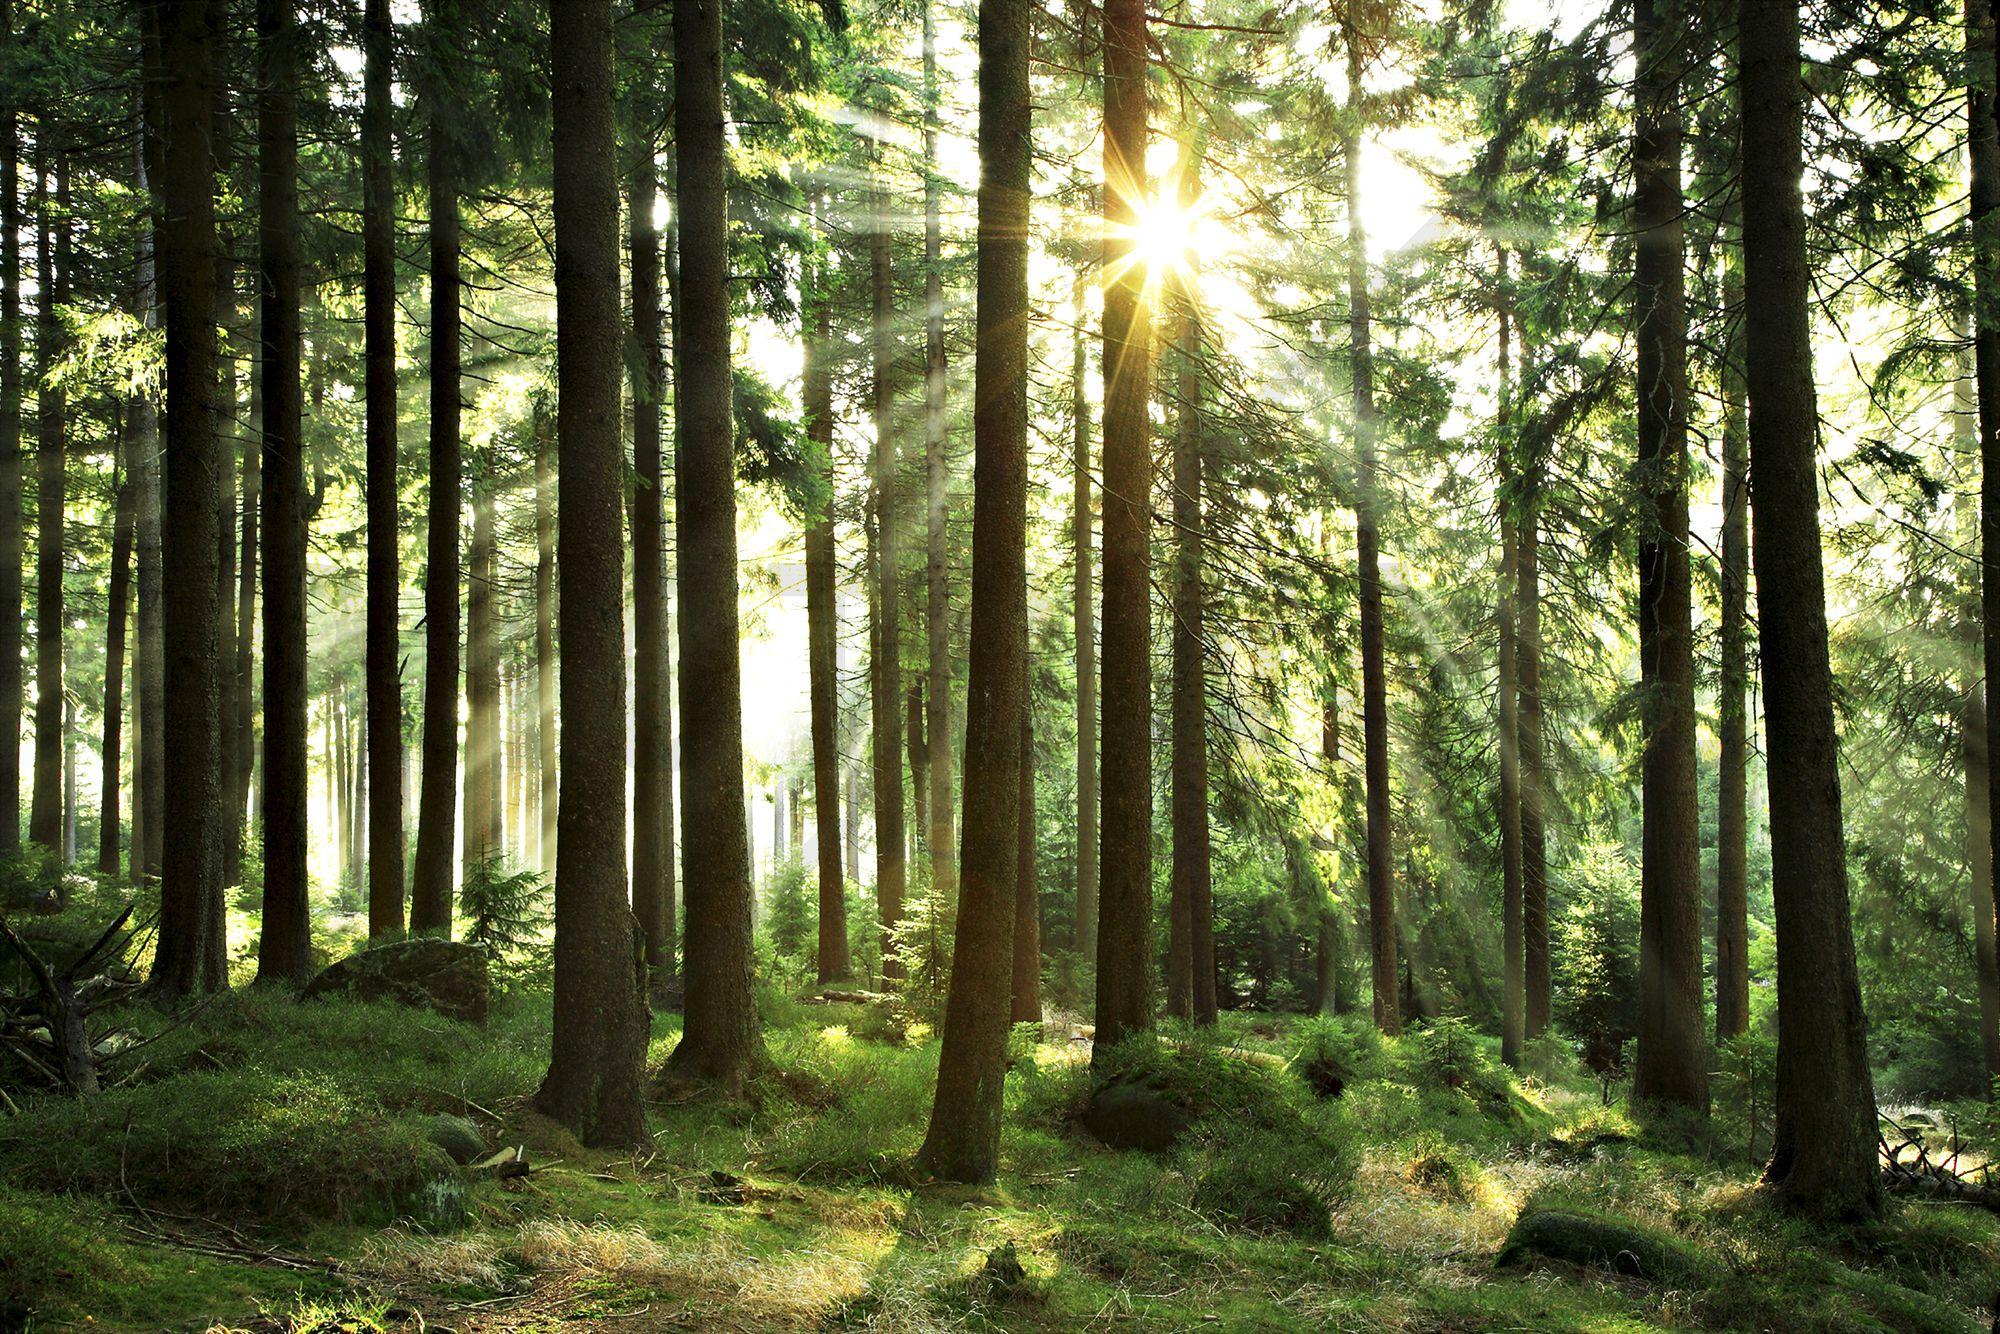 Wald - Sunbeam Through Trees - Fototapete & Tapete - Photowall